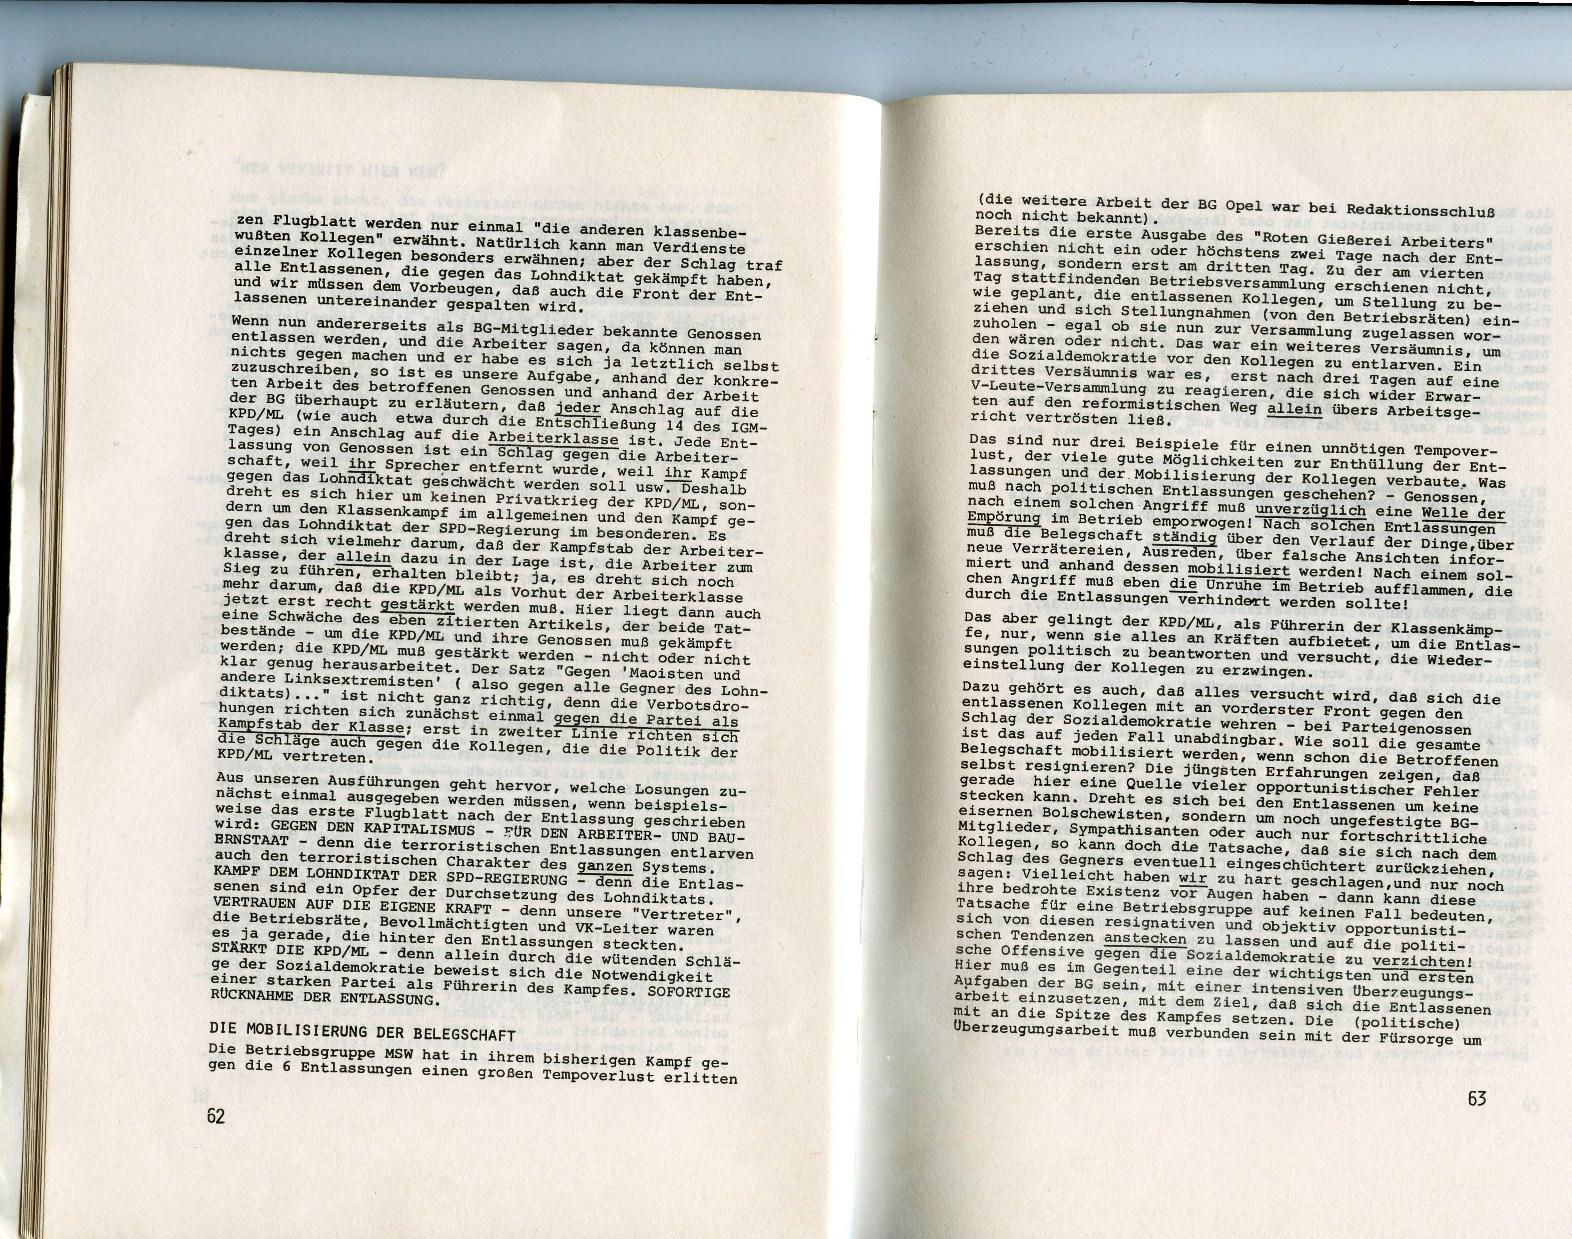 ZB_Parteiarbeiter_1971_09_32